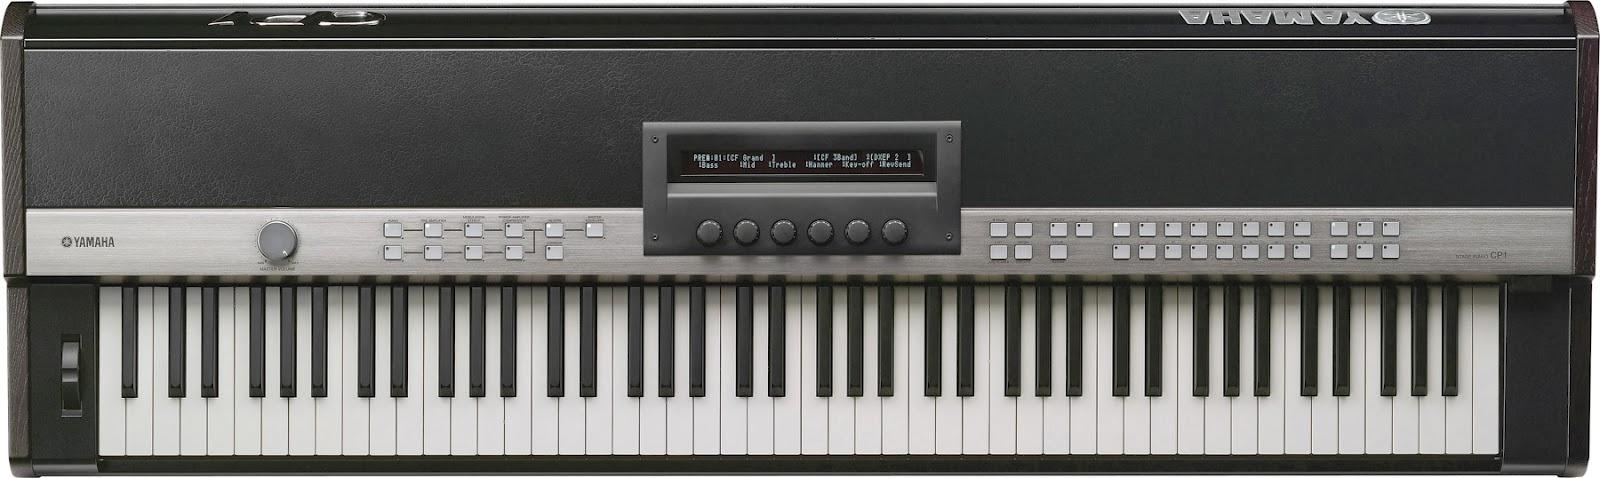 Optimum Musica: Yamaha Keyboard/ Digital Piano